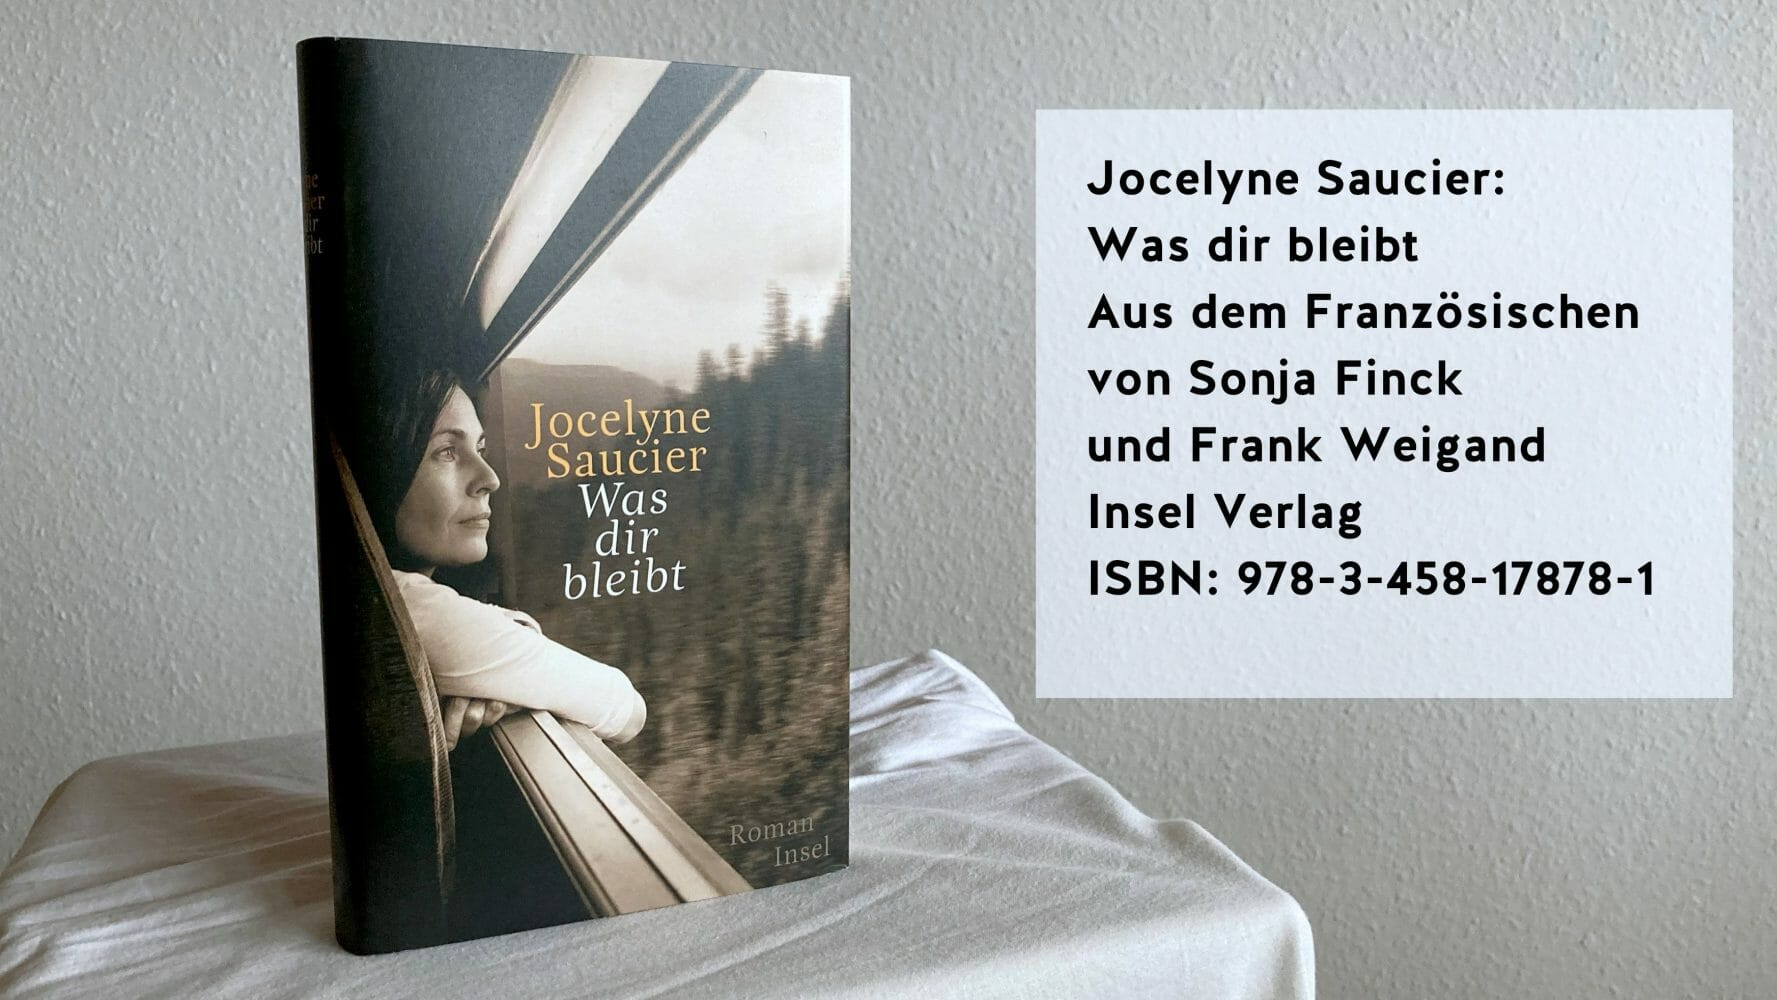 Jocelyne Saucier: Was dir bleibt